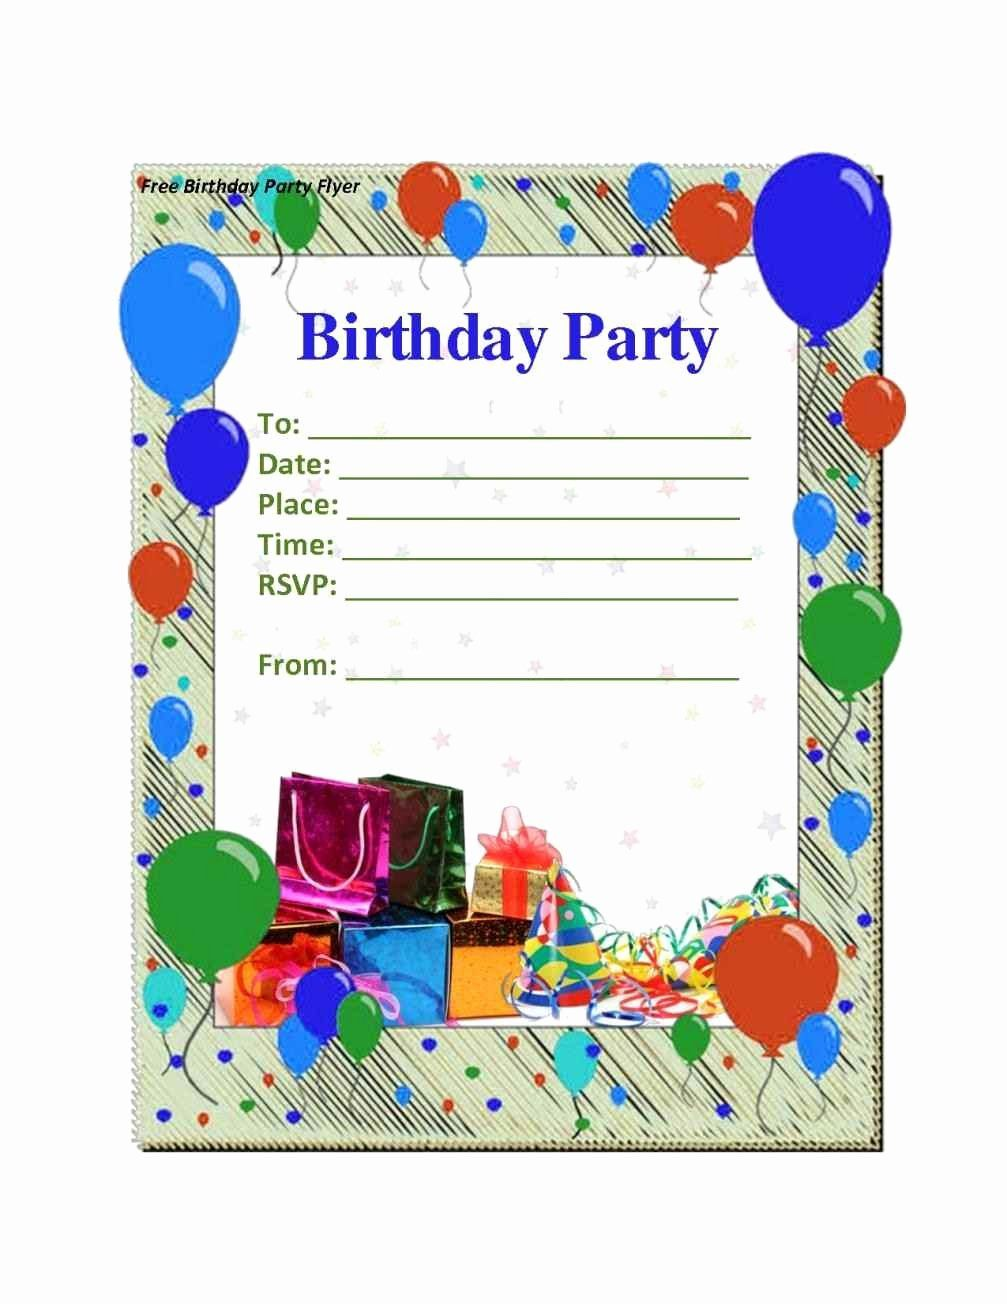 Free Birthday Party Invitation Templates Awesome Free Boy Birthday Inv Birthday Invitation Card Template Invitation Card Birthday Birthday Invitation Templates